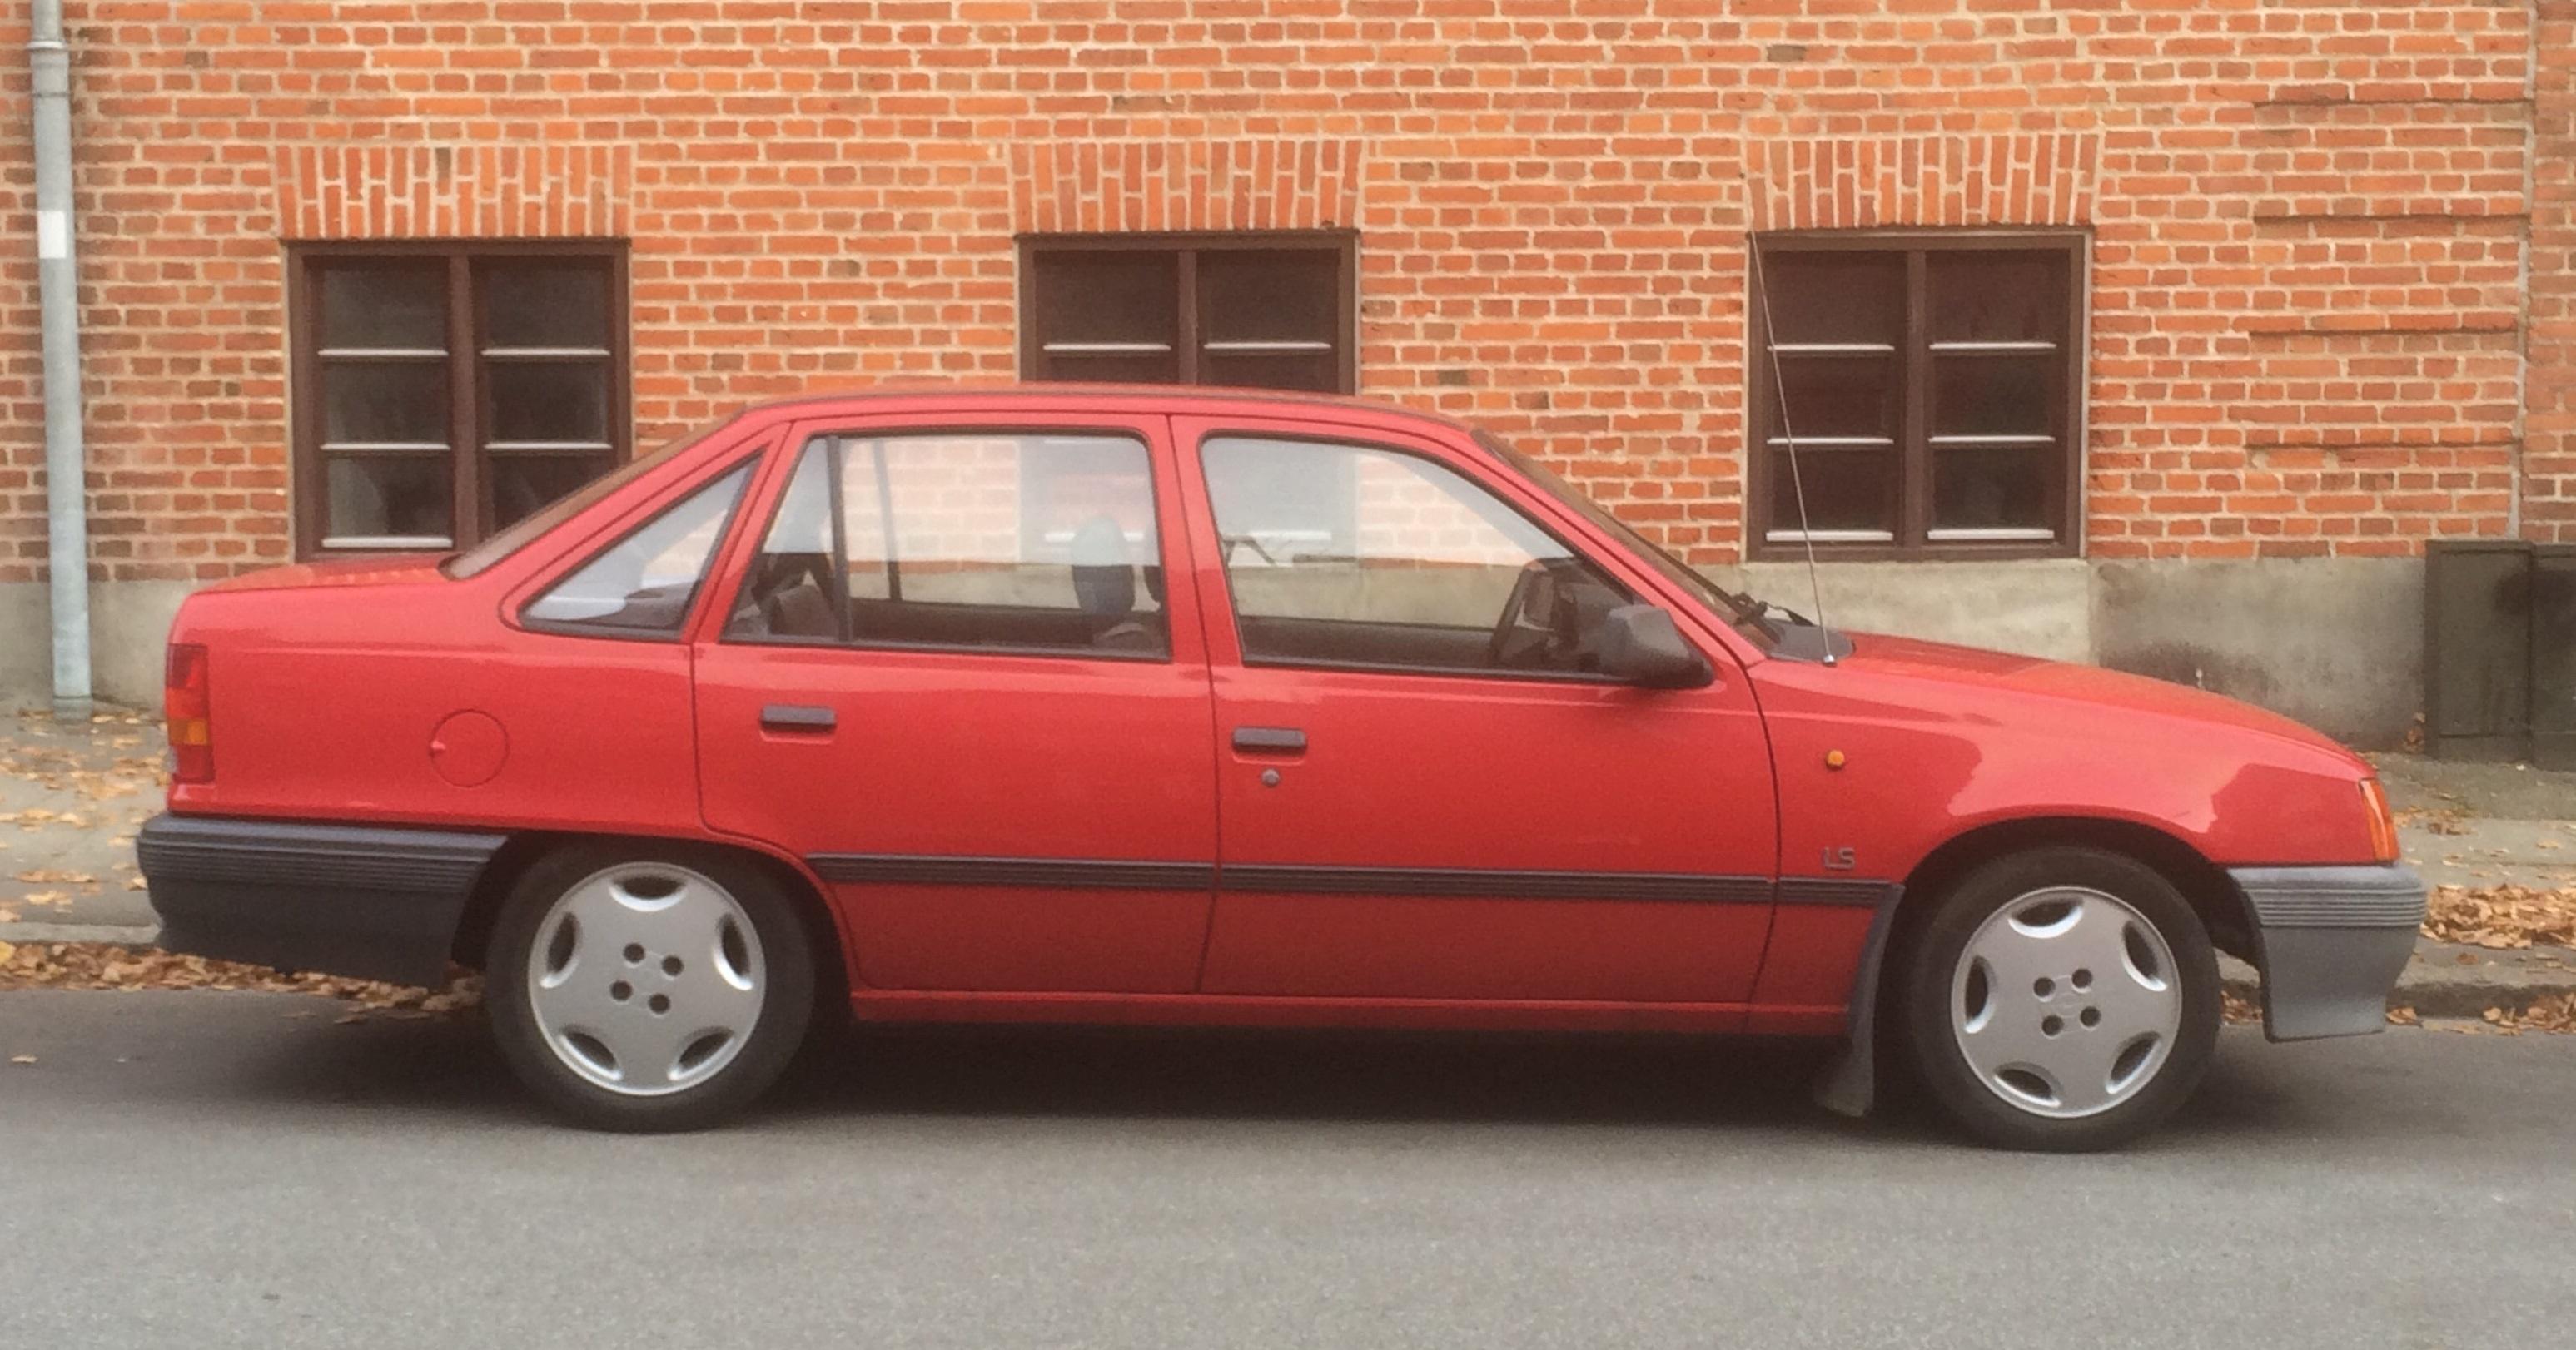 Vauxhall Astra E 1984 - 1991 Station wagon 5 door #7